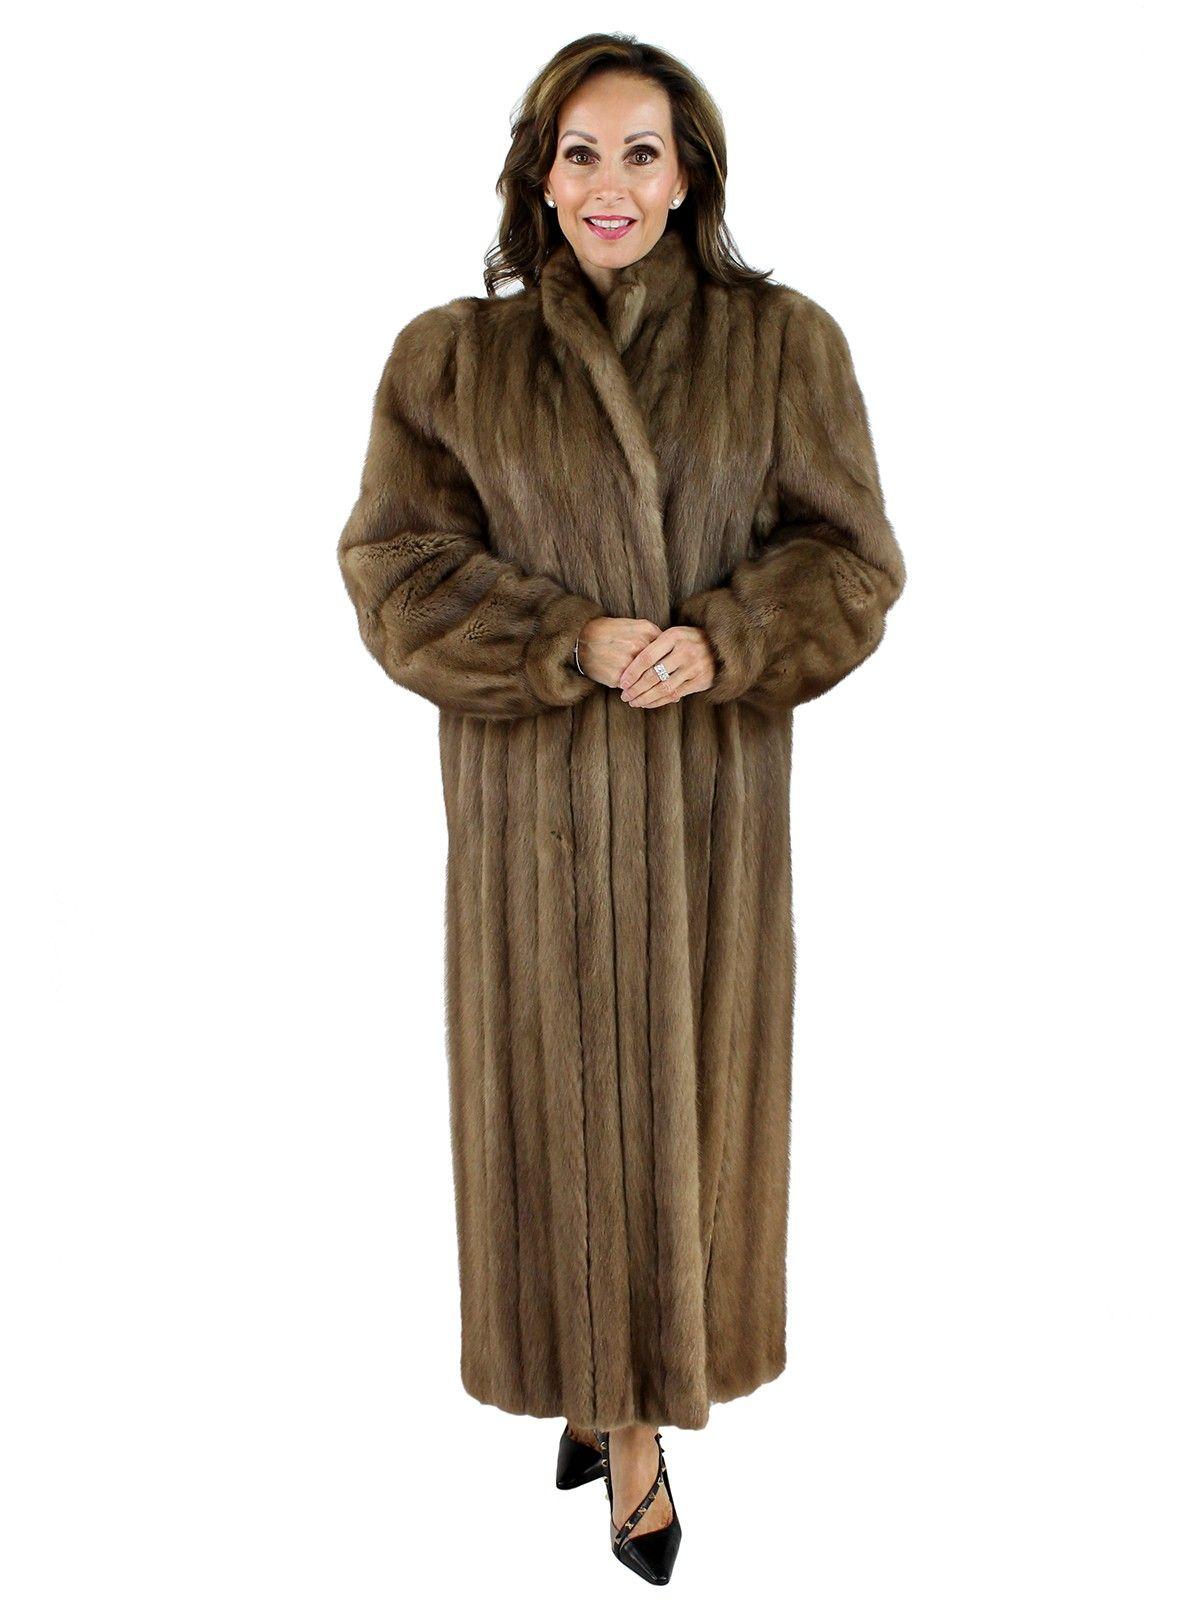 b792bfd09 Pecan Mink Fur Coat - Women's Large in 2019 | clothes | Fur coat ...